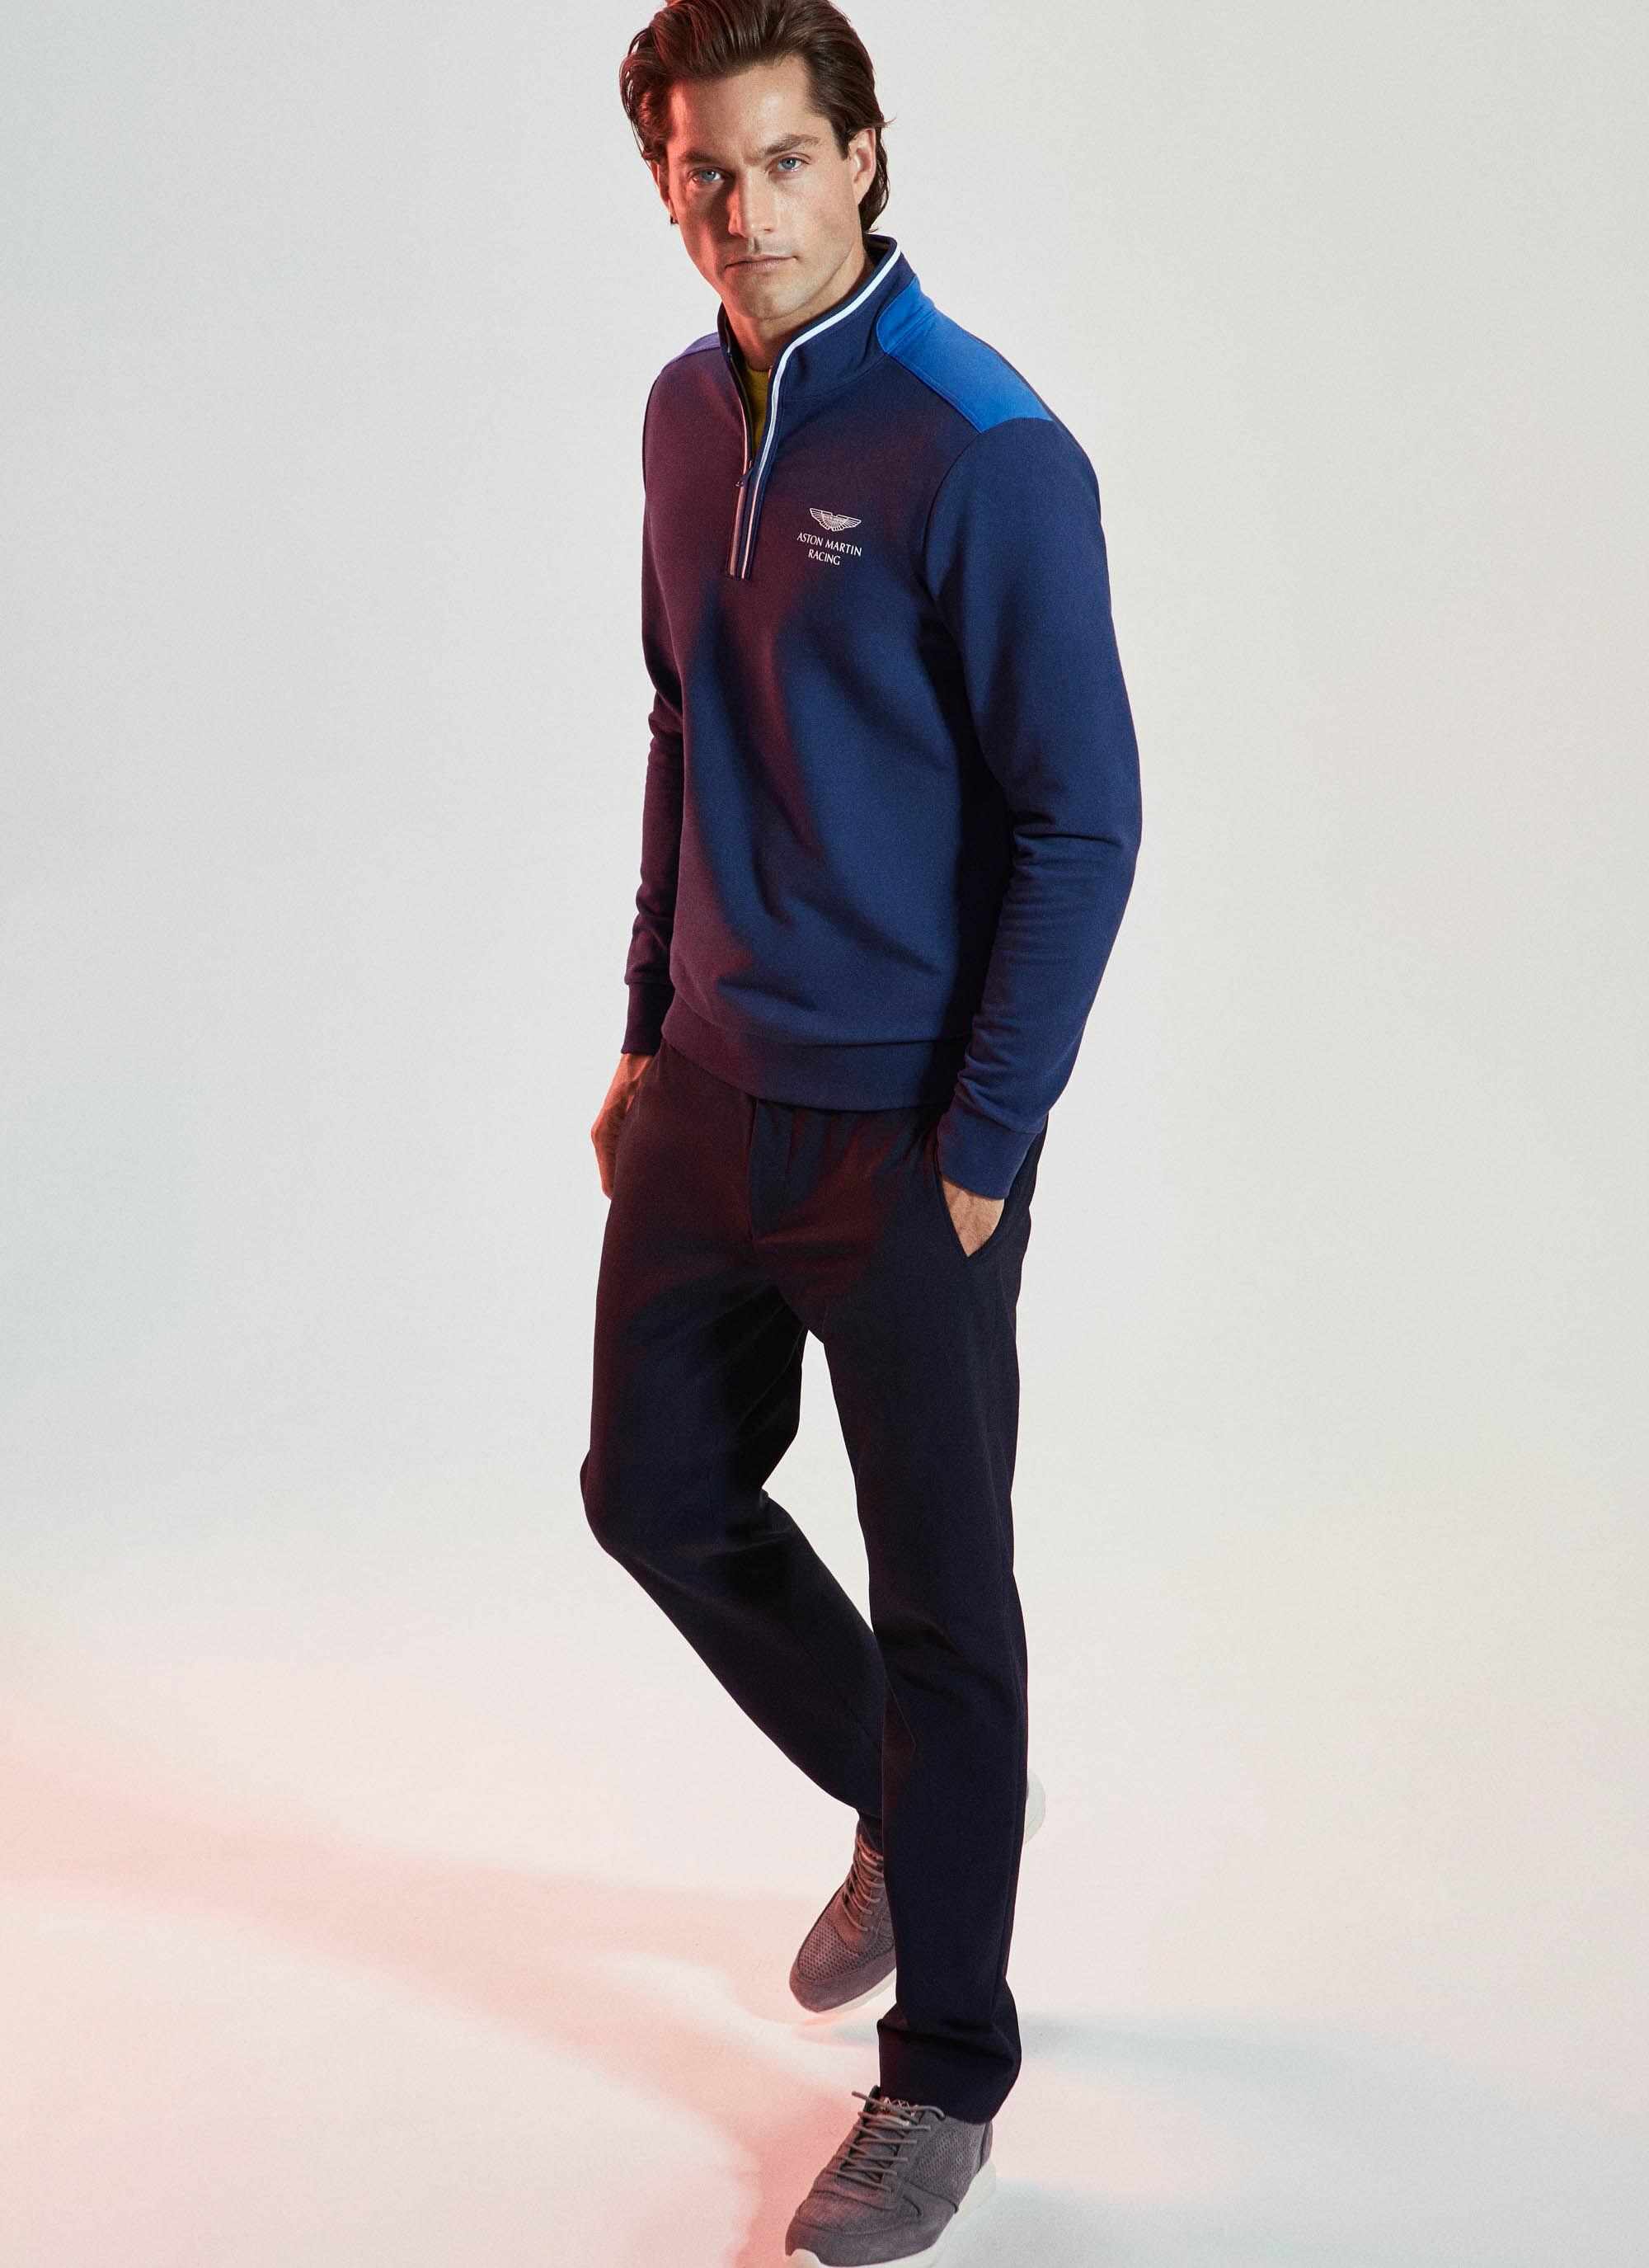 aston martin racing men's stretch cotton half zip sweater | x-small | dark blue